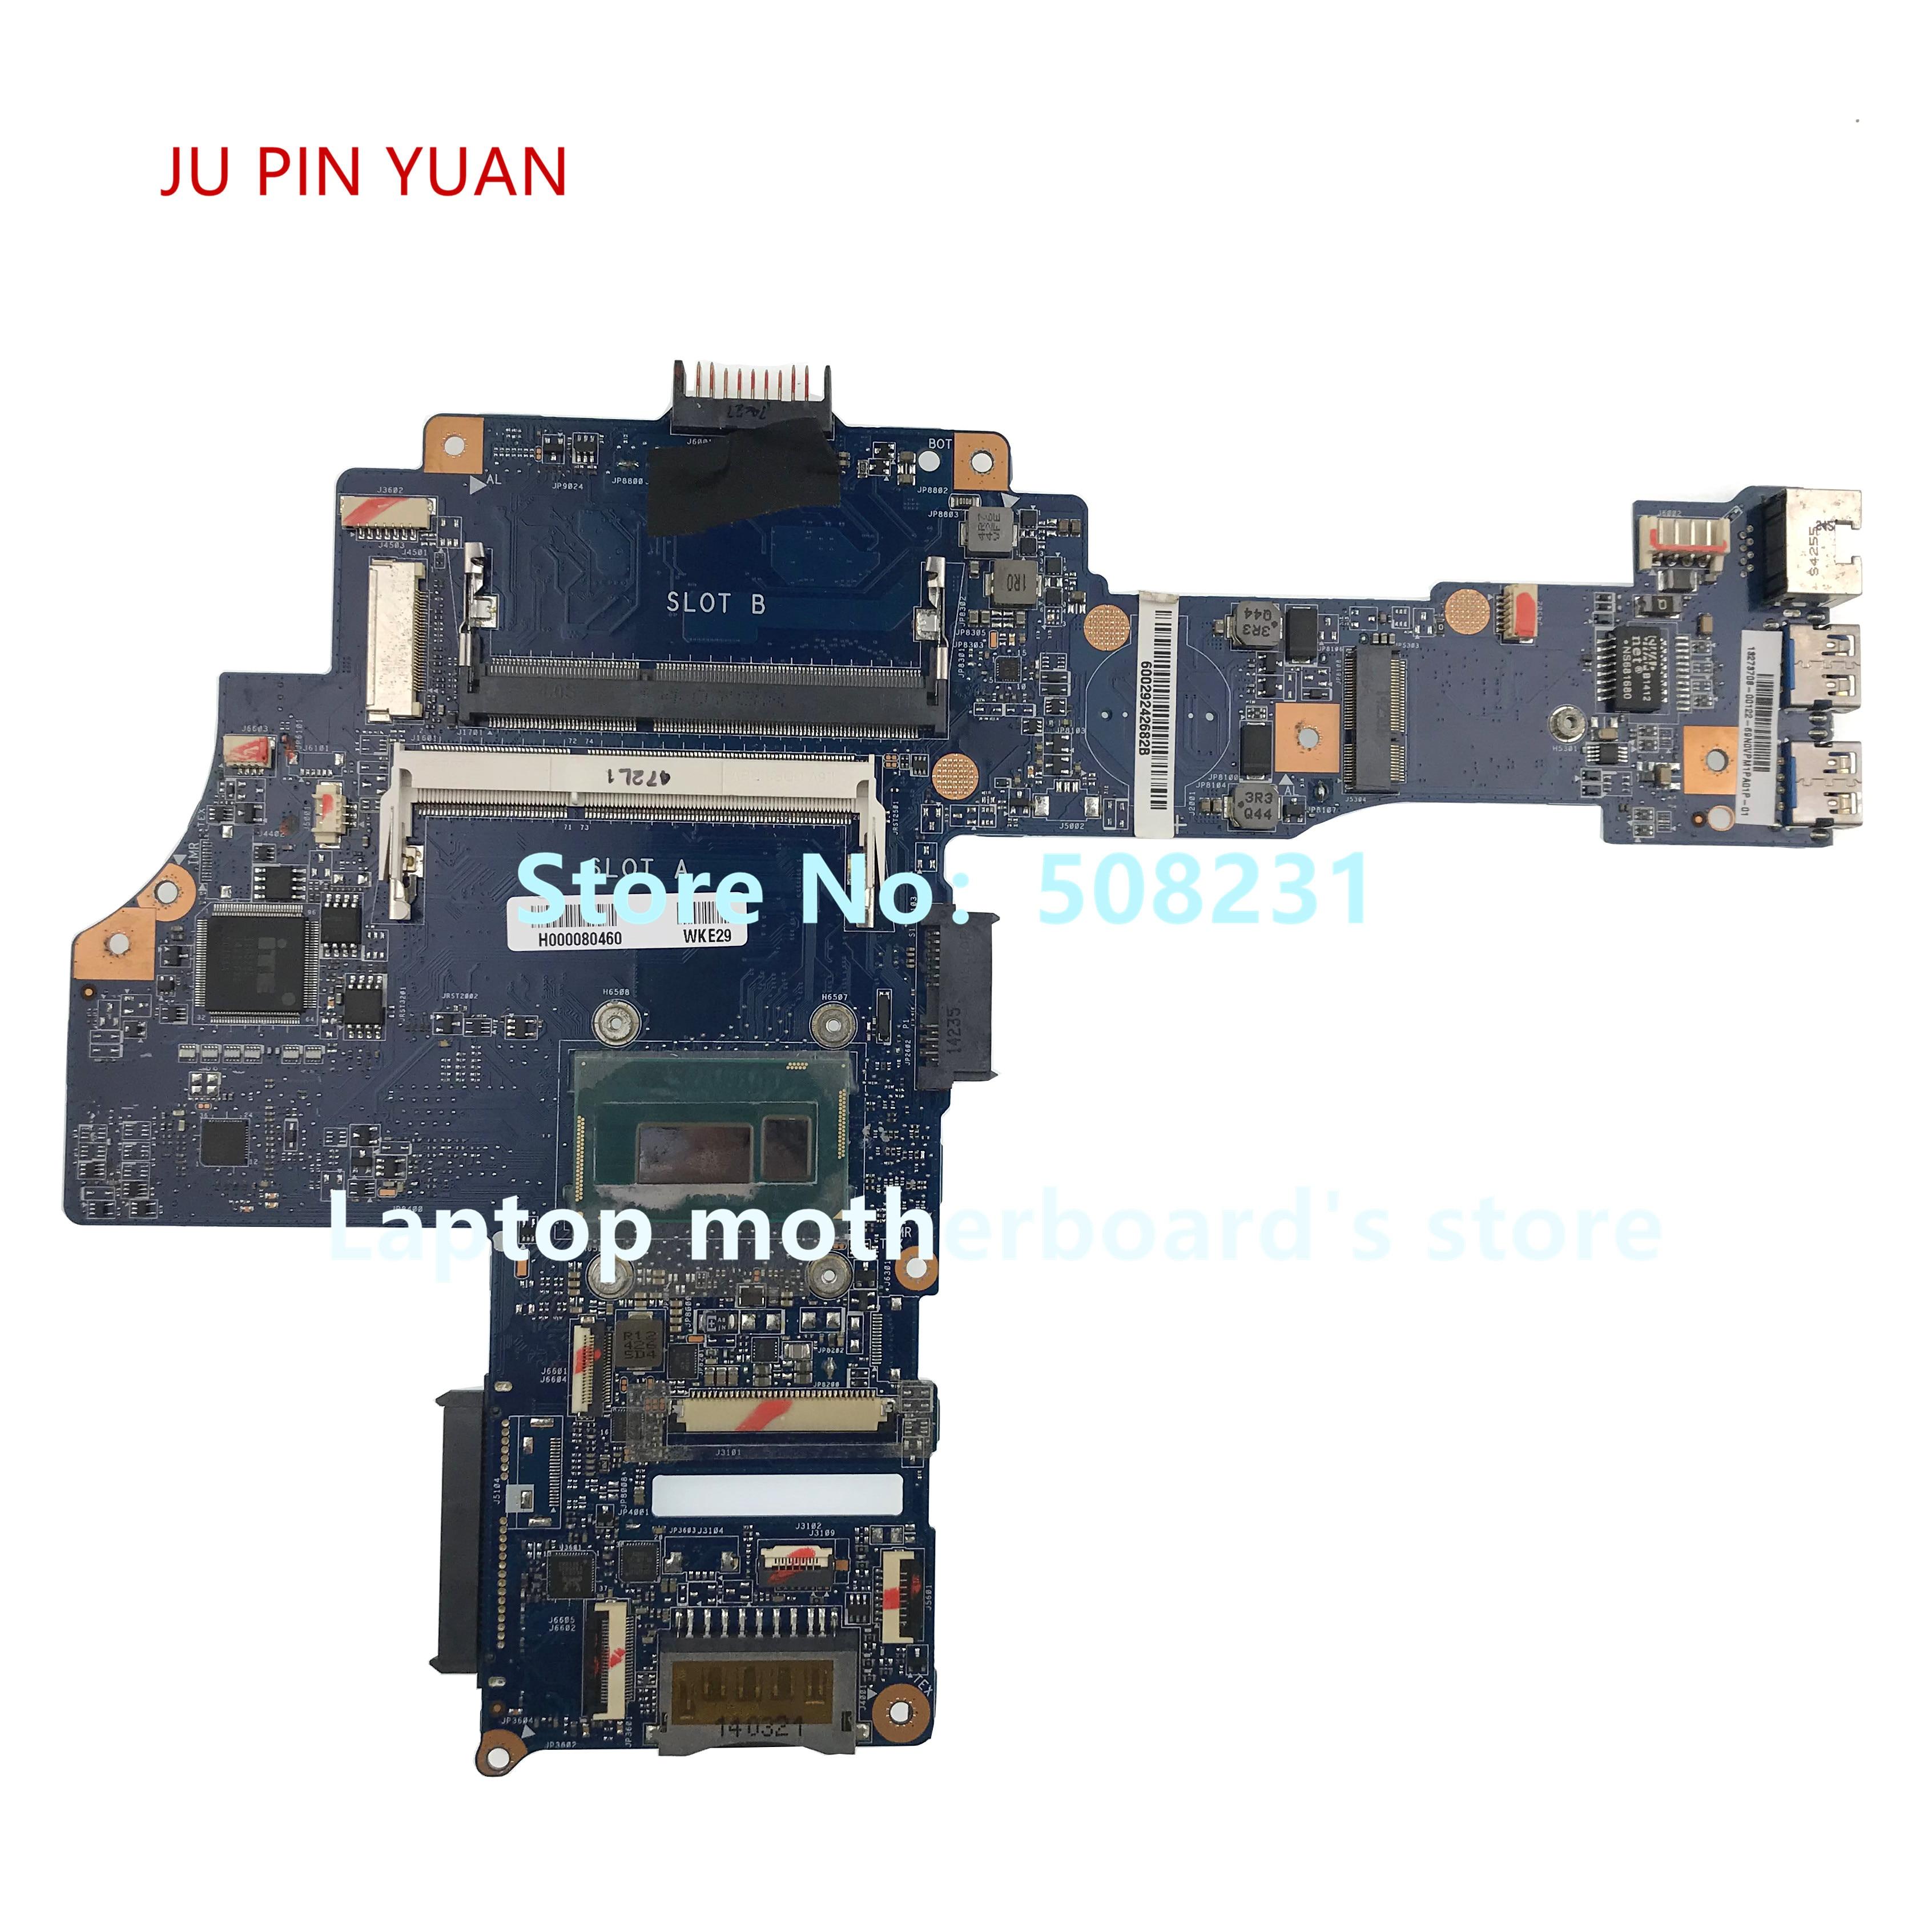 CA10SU/CU H000080460 بلاكا قاعدة الفقرة توشيبا E45T-B L45T-B S40-B i3-4005U 30pin Completamente Probado ، Correcto